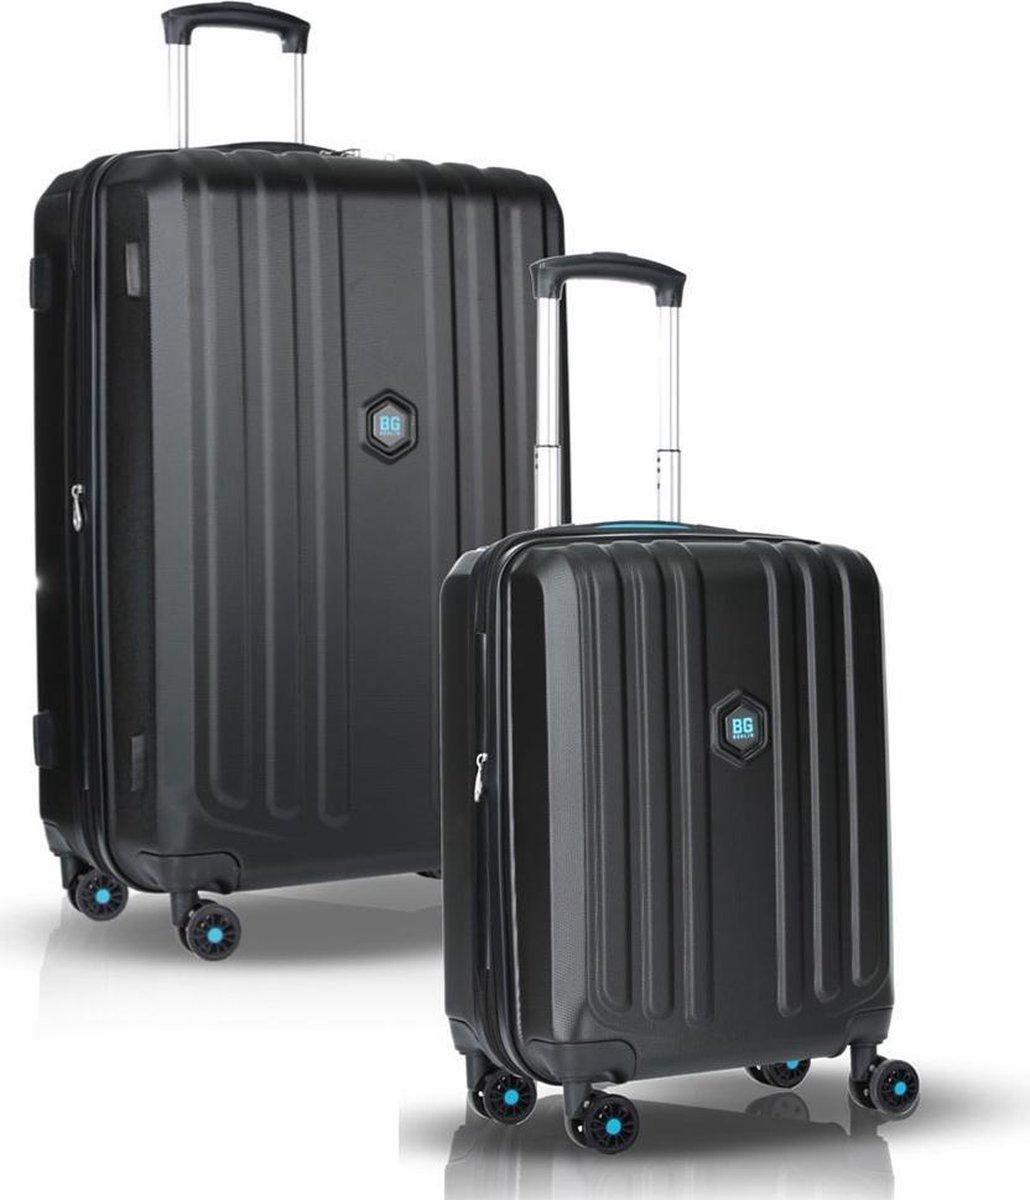 Enduro 1+1 kofferset (28